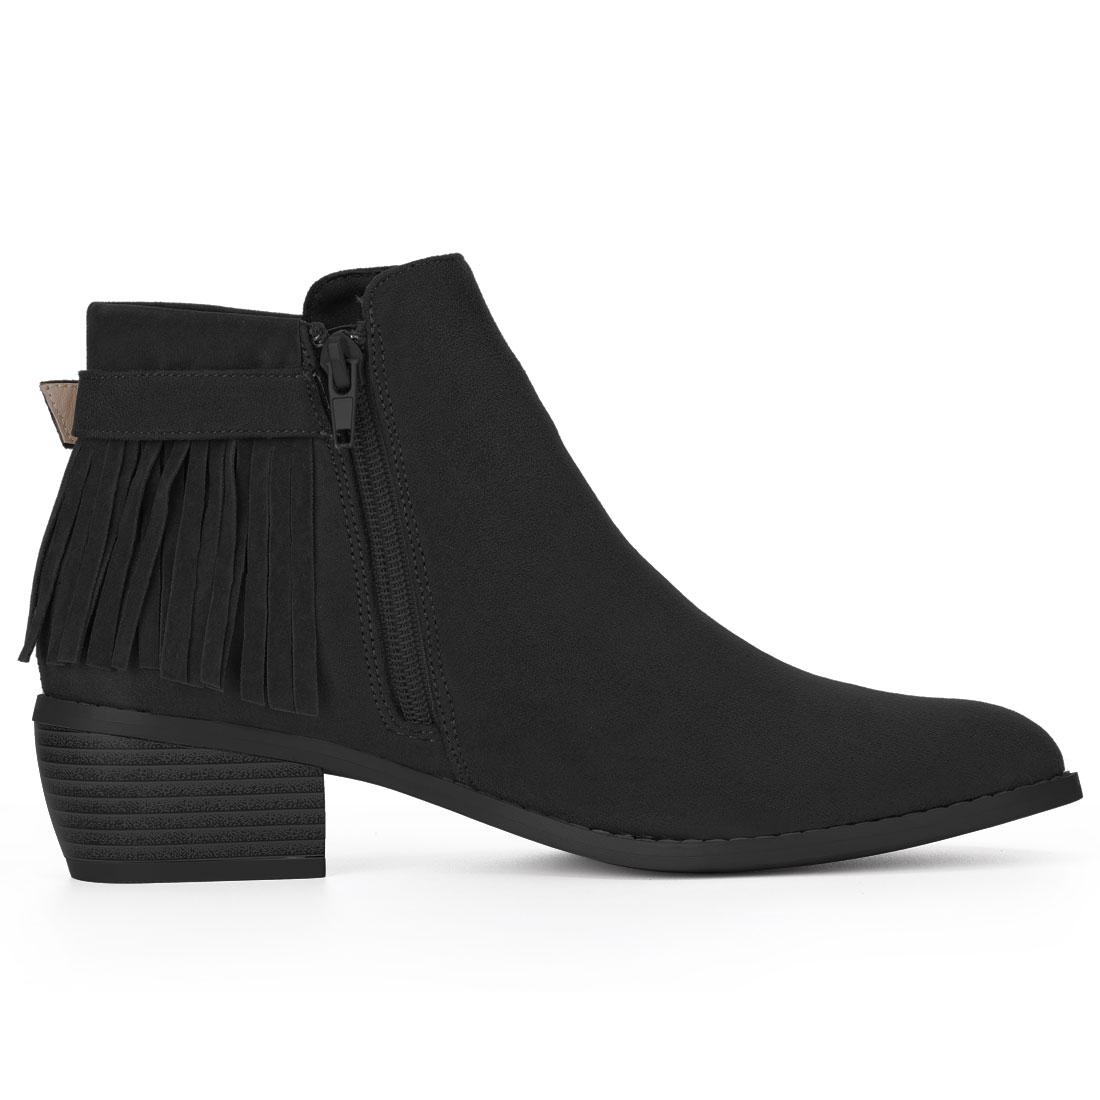 Women Buckle Strap Tassel Low Chunky Heel Booties Black US 8